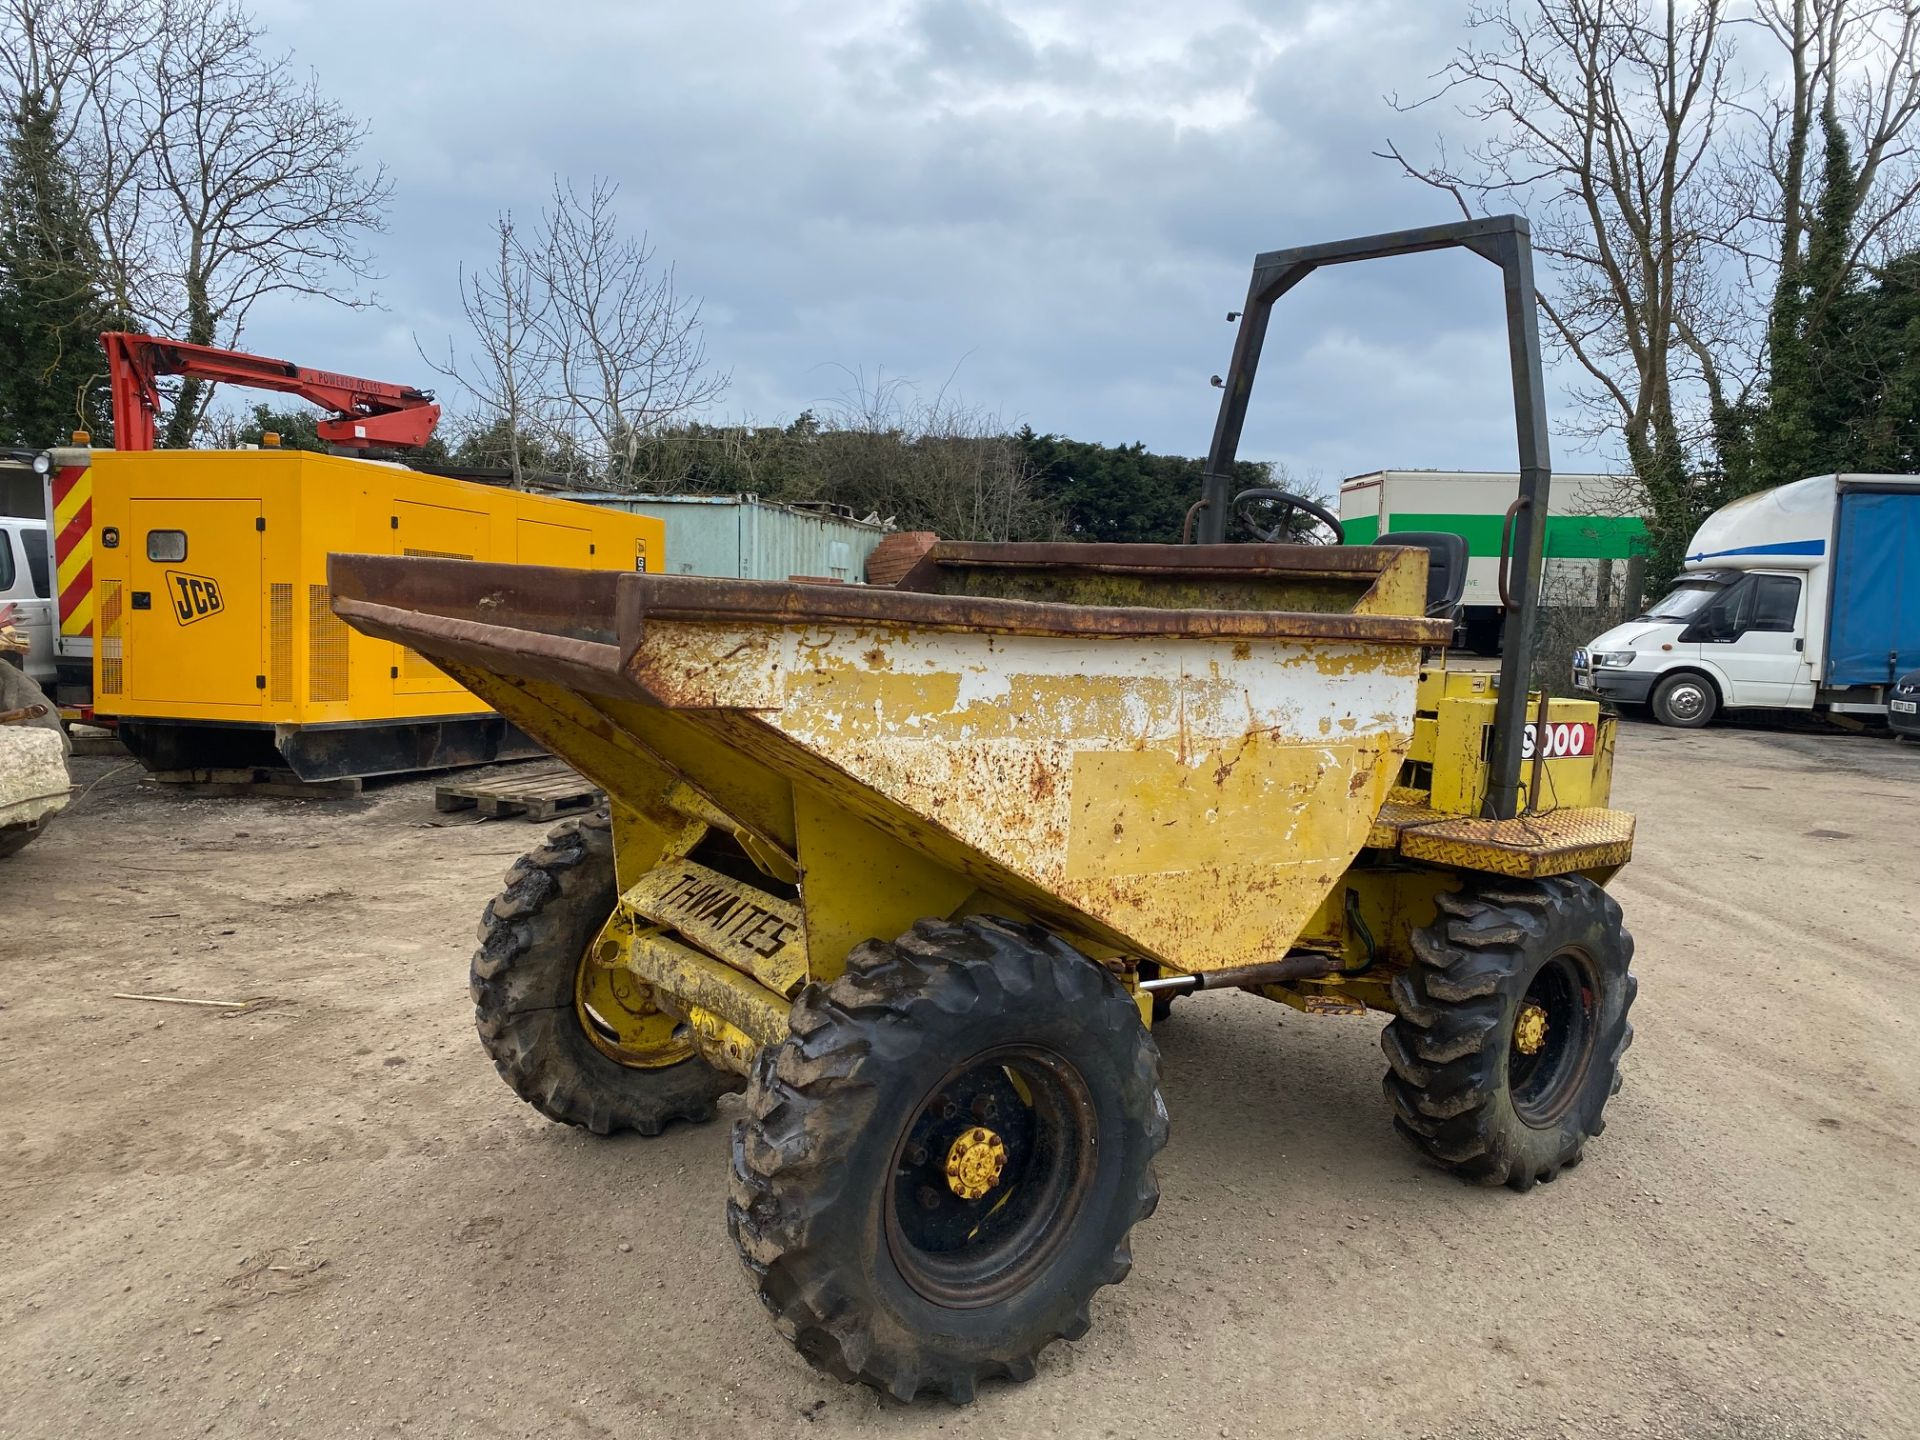 Thwaites 4 ton dumper, 4x4, electric start, Roll bar, 3 cylinder Lister Petter engine - Image 4 of 5